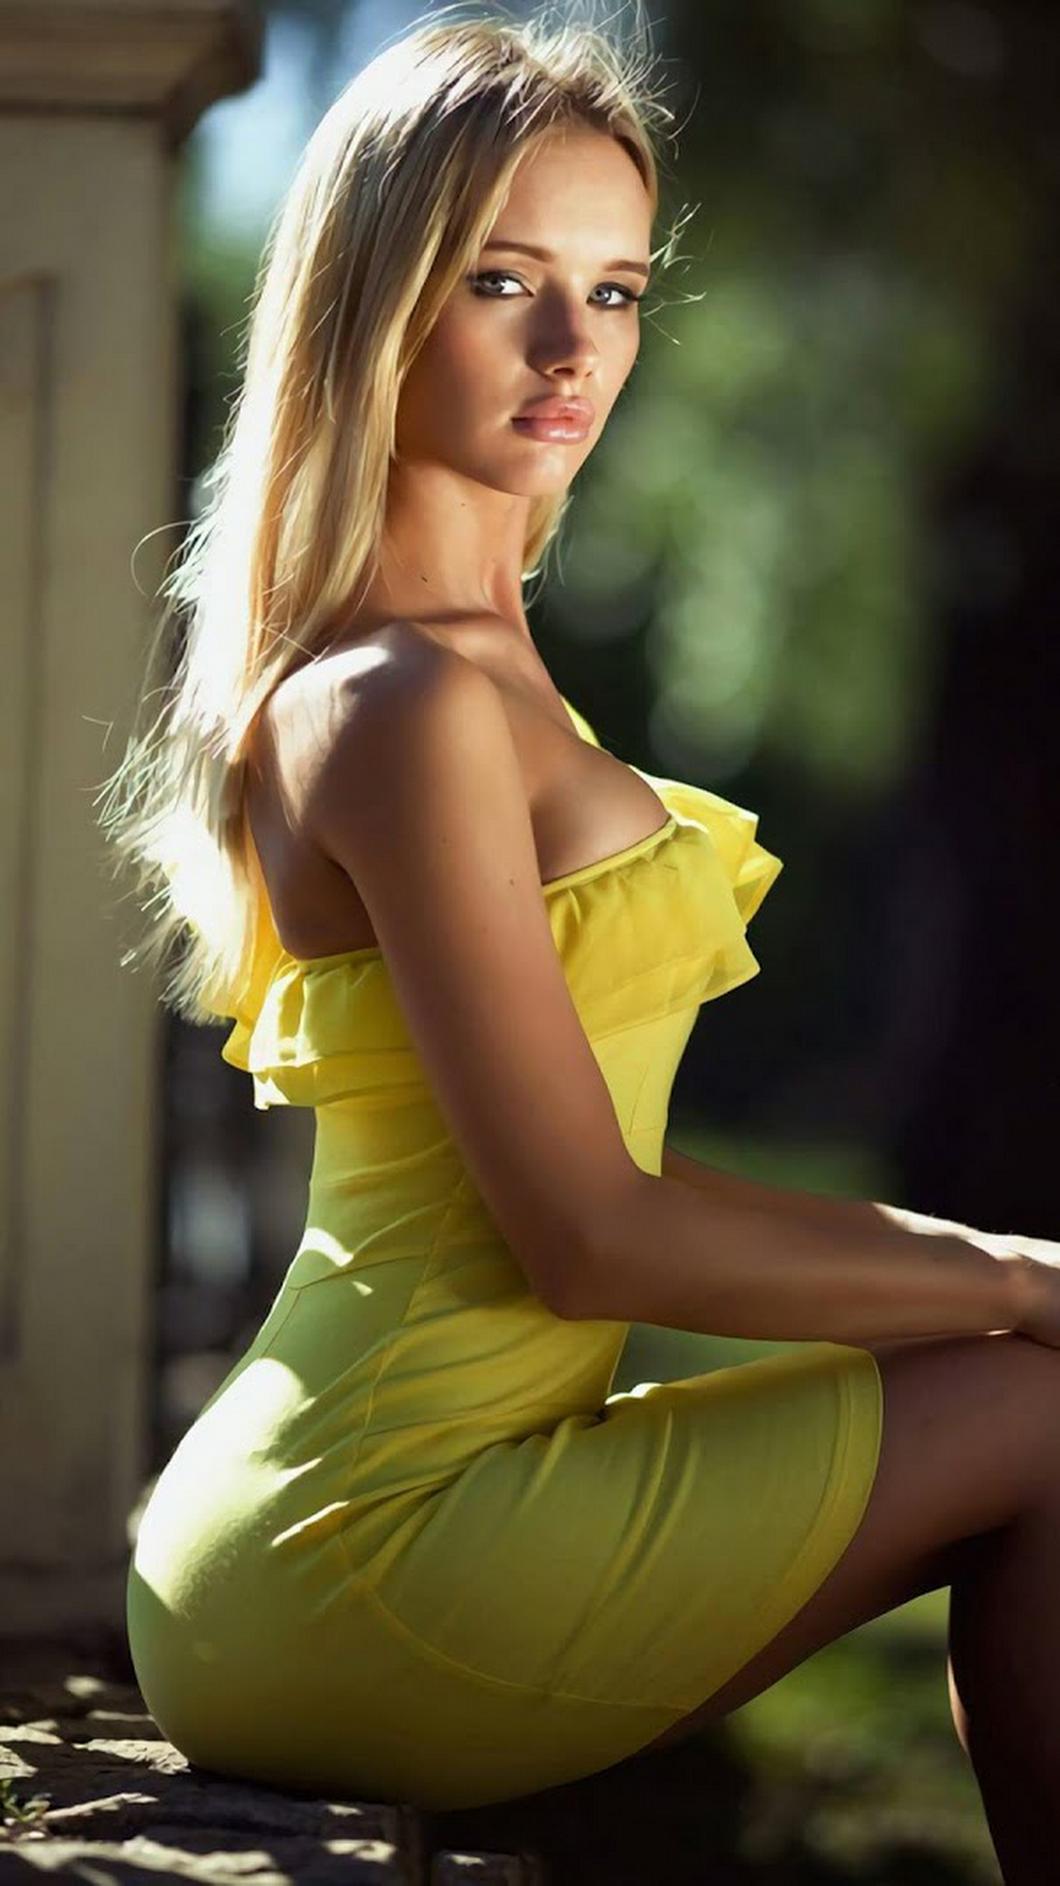 ŘÕŜÊ Ř - google+ | girls | pinterest | google, rose and glamour